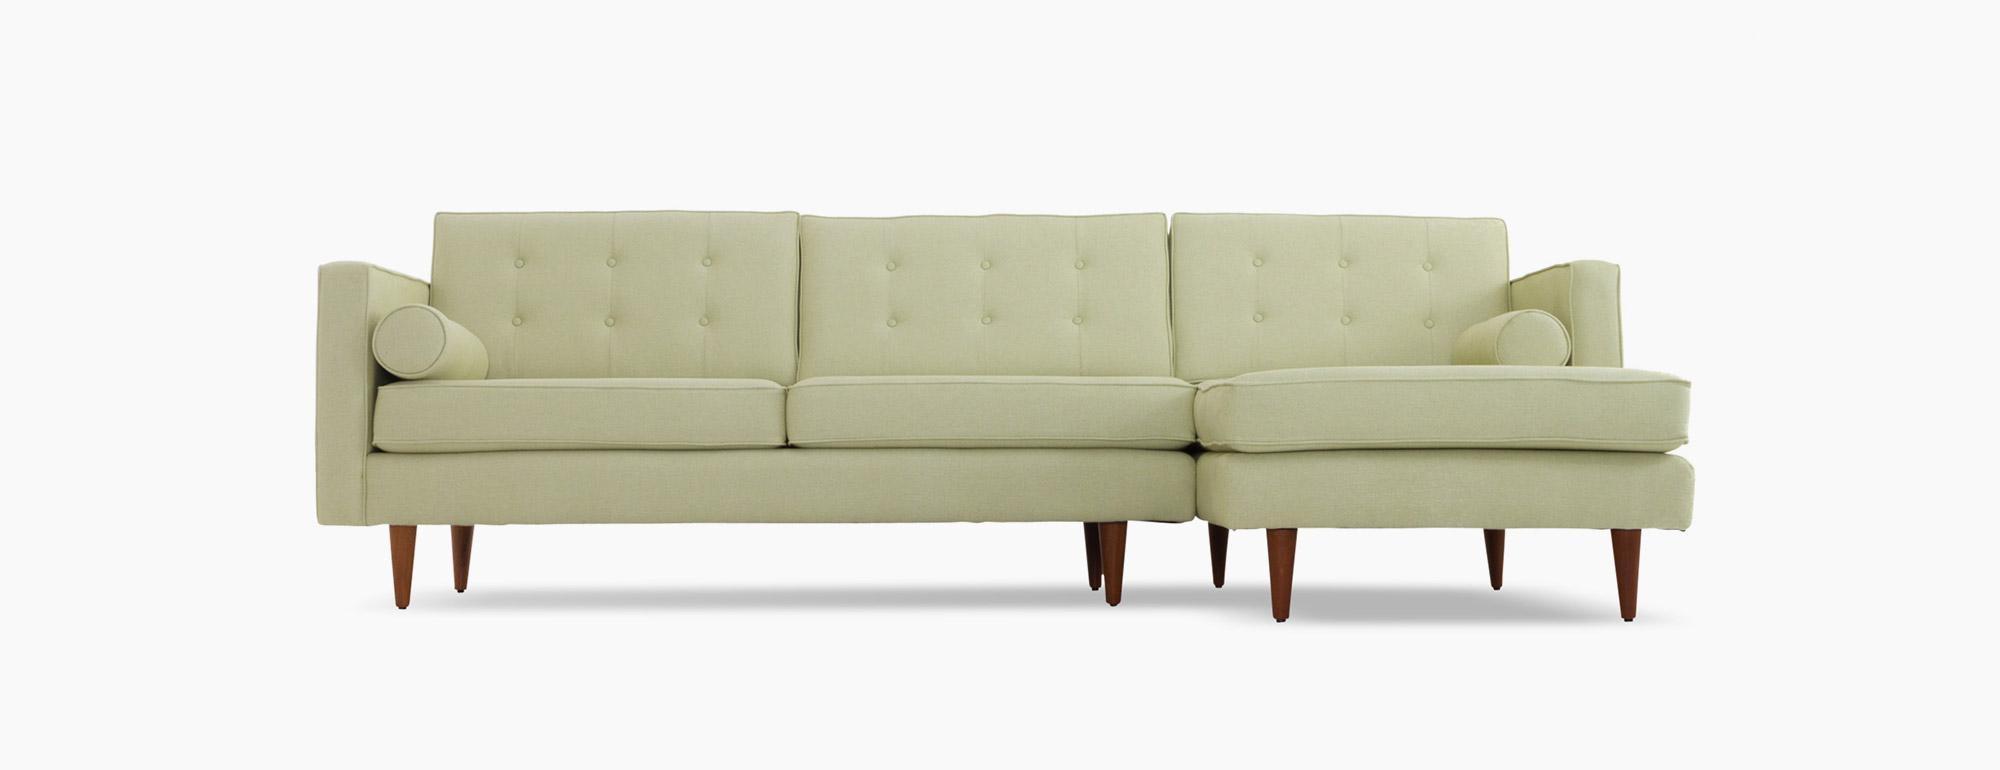 Braxton Sectional | Joybird Throughout Braxton Sectional Sofa (View 9 of 15)